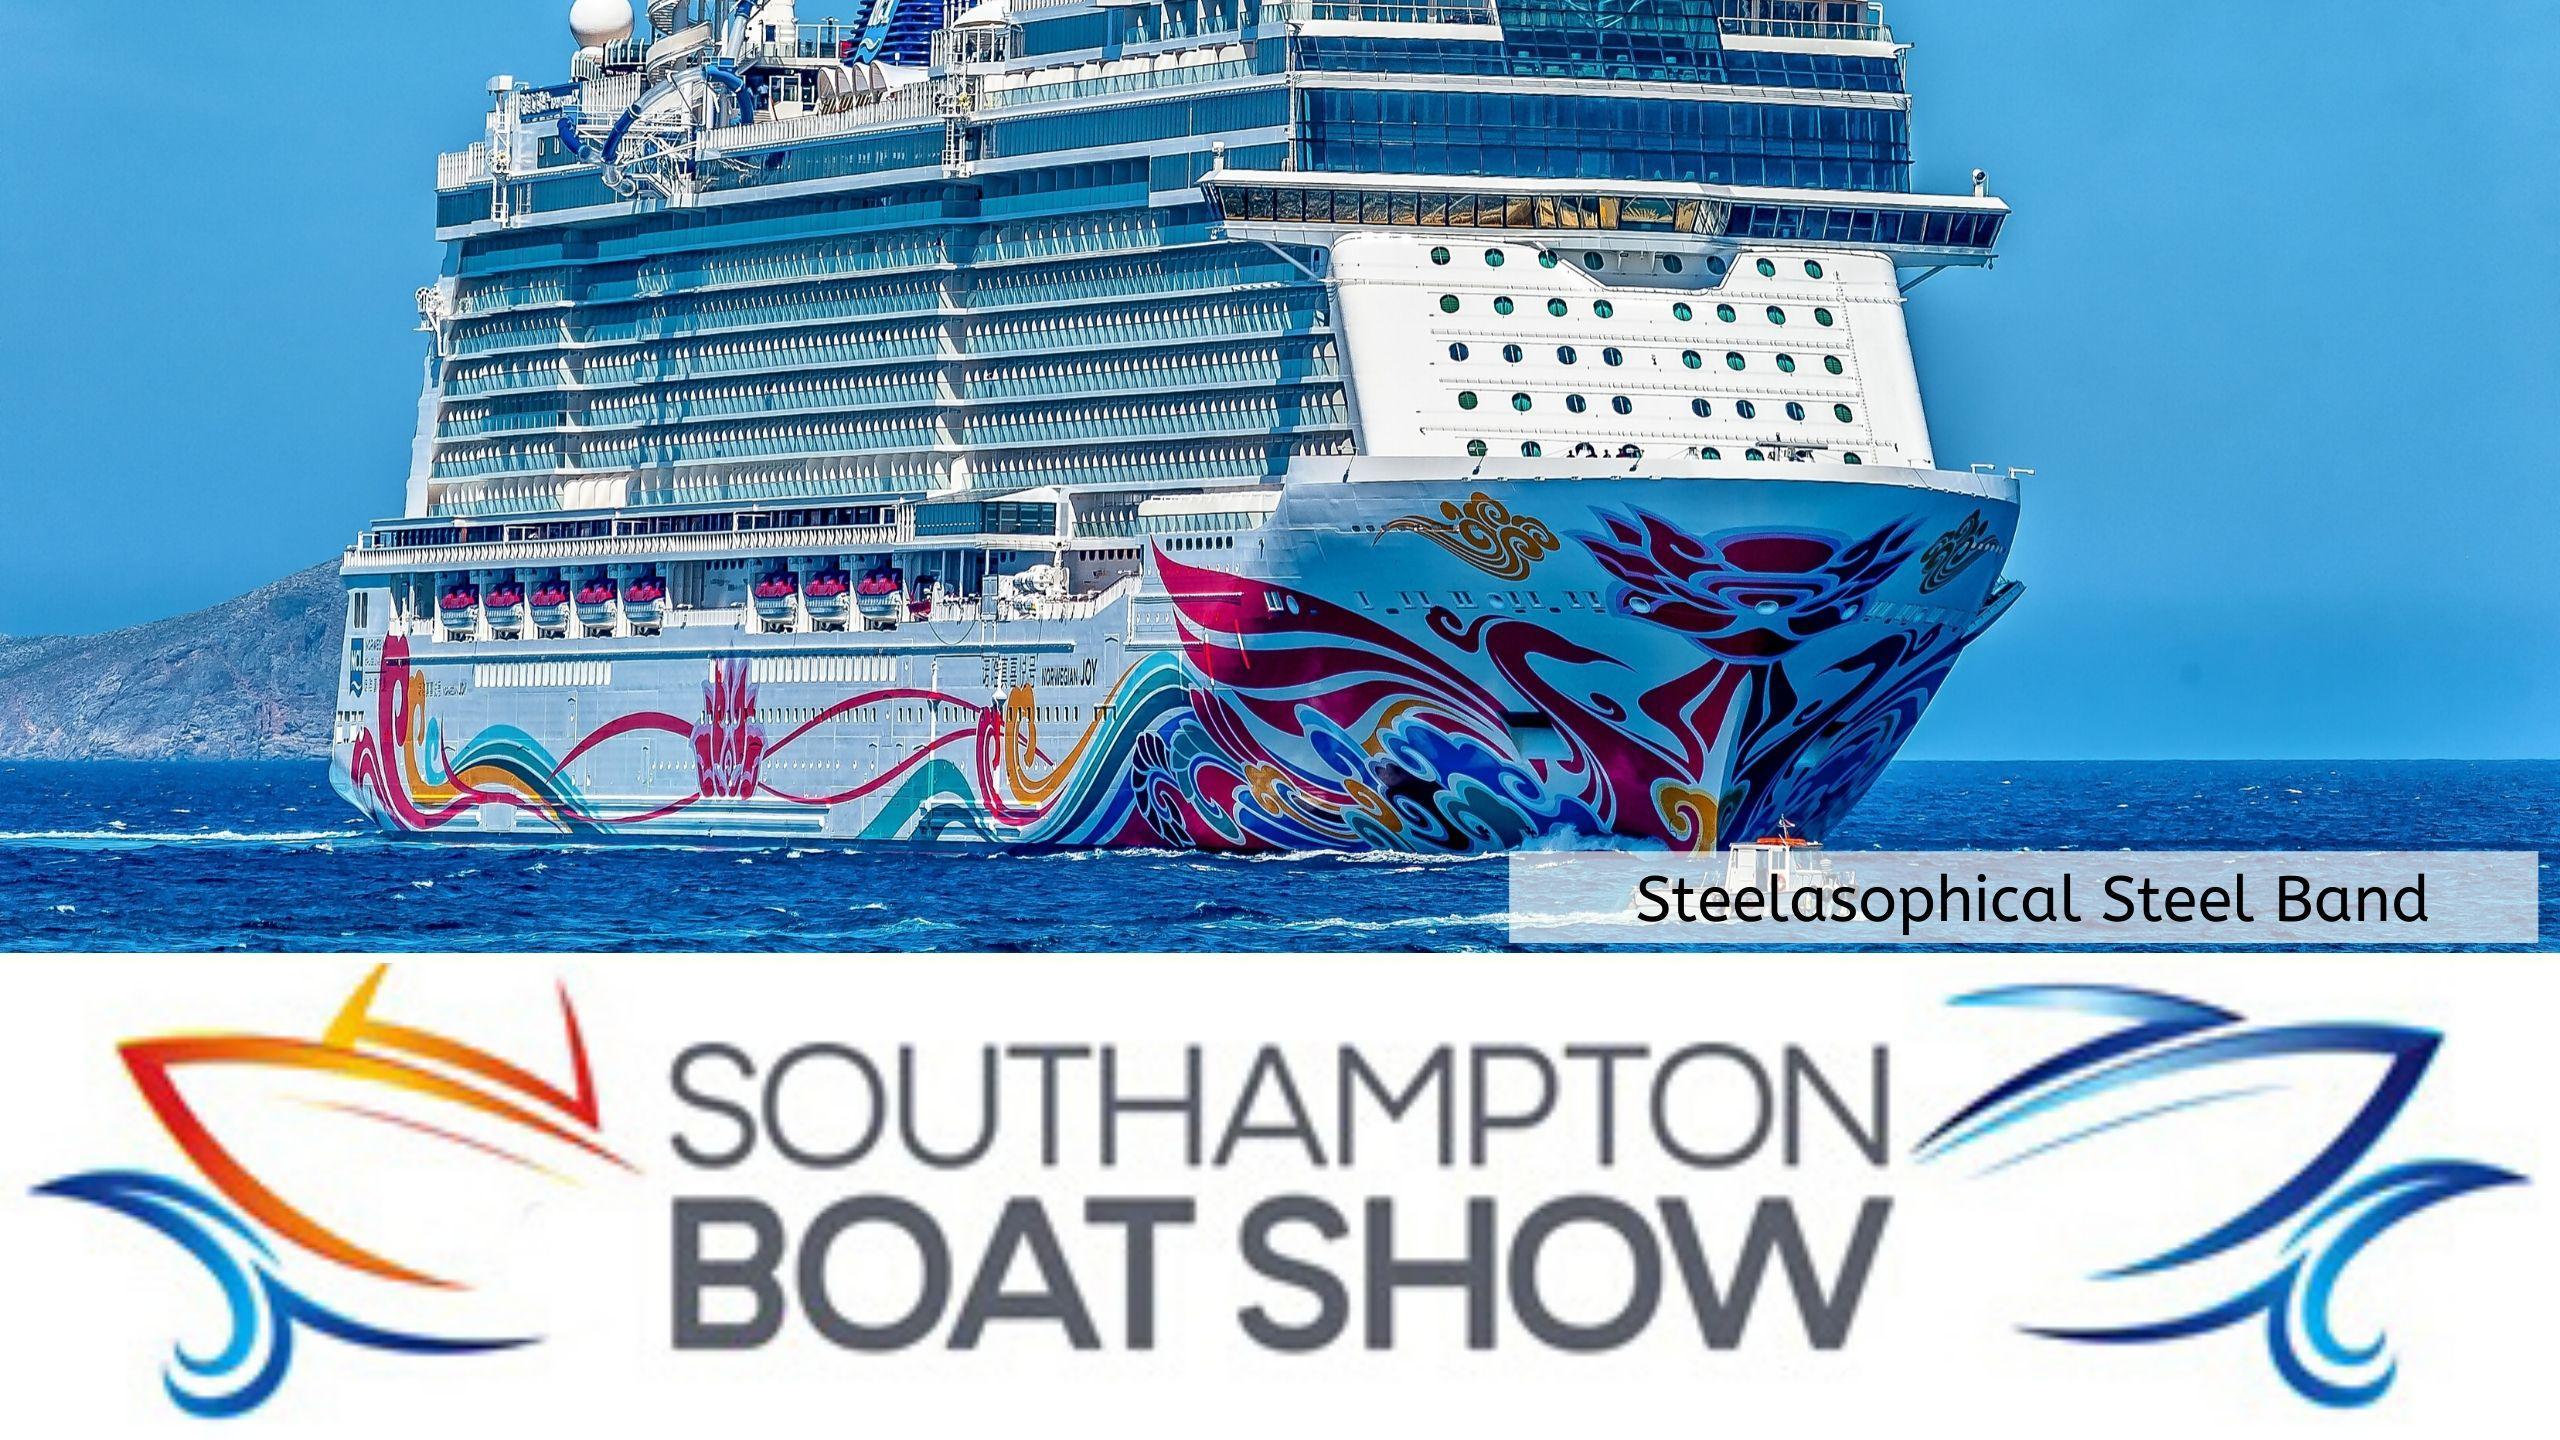 Steelasophical Steel Band Southampton Boat Show Yacht Market dcs